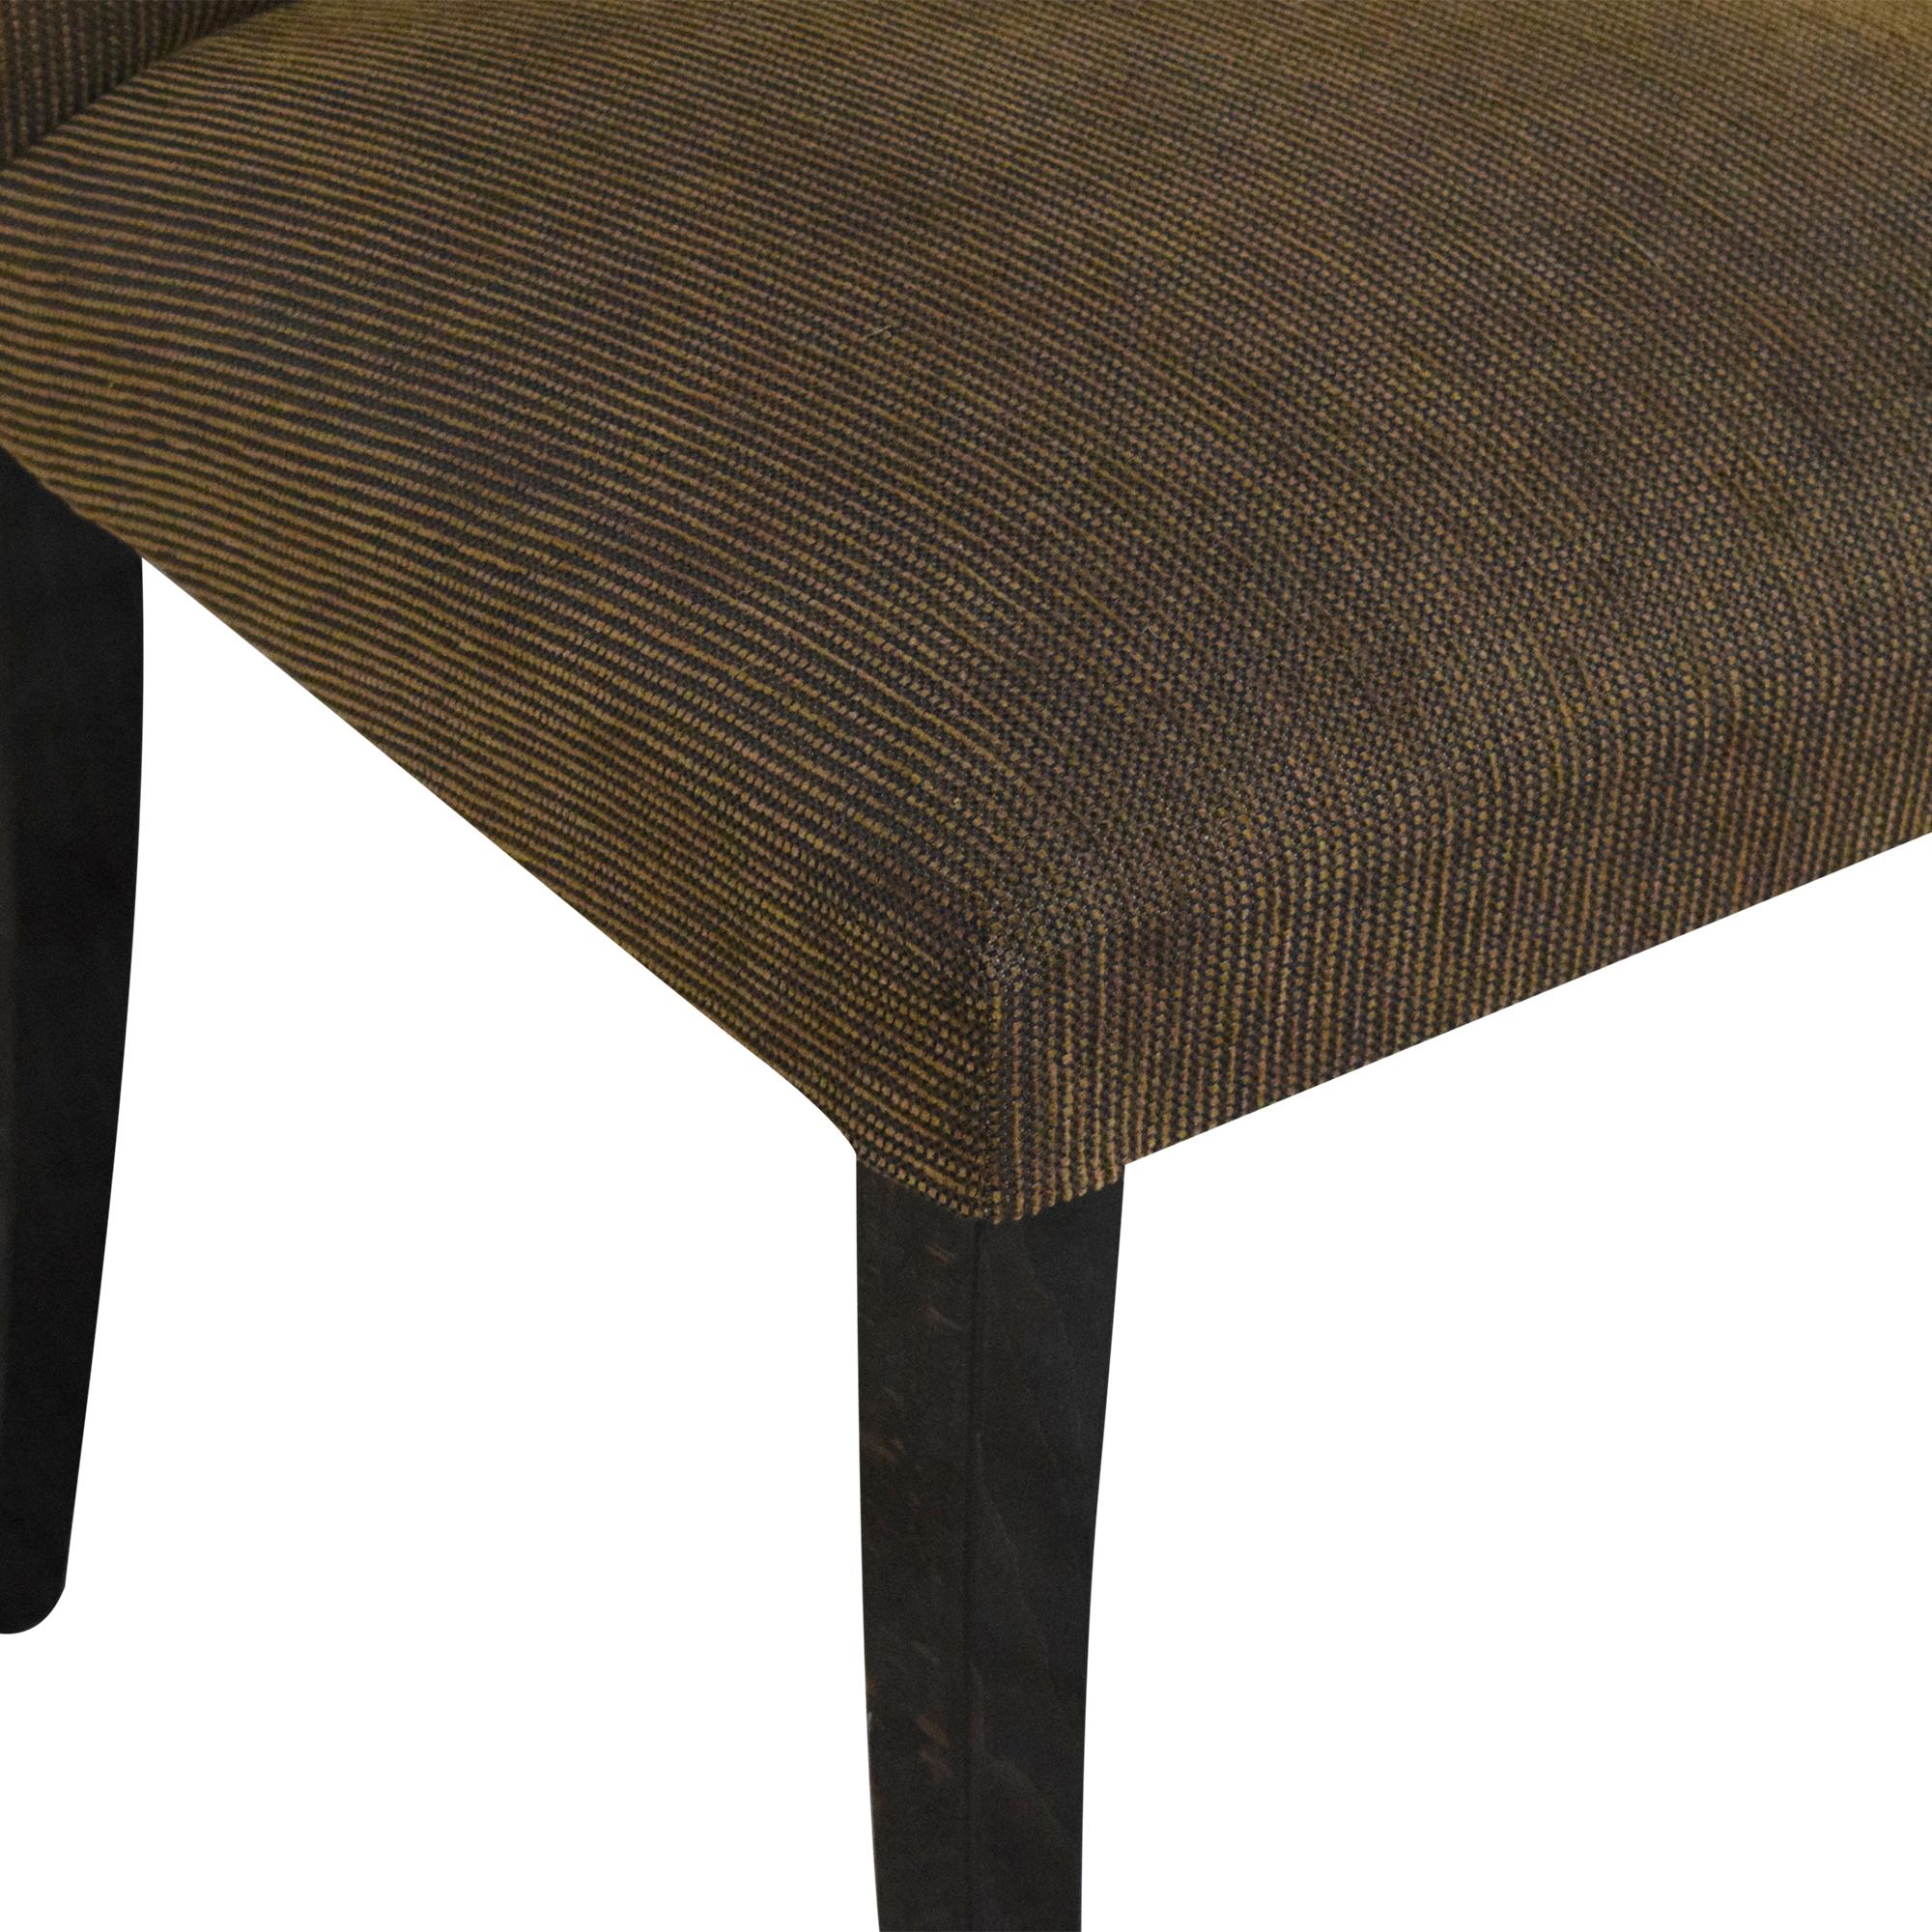 Pietro Costantini Pietro Costantini Waldorf Dining Side Chairs discount